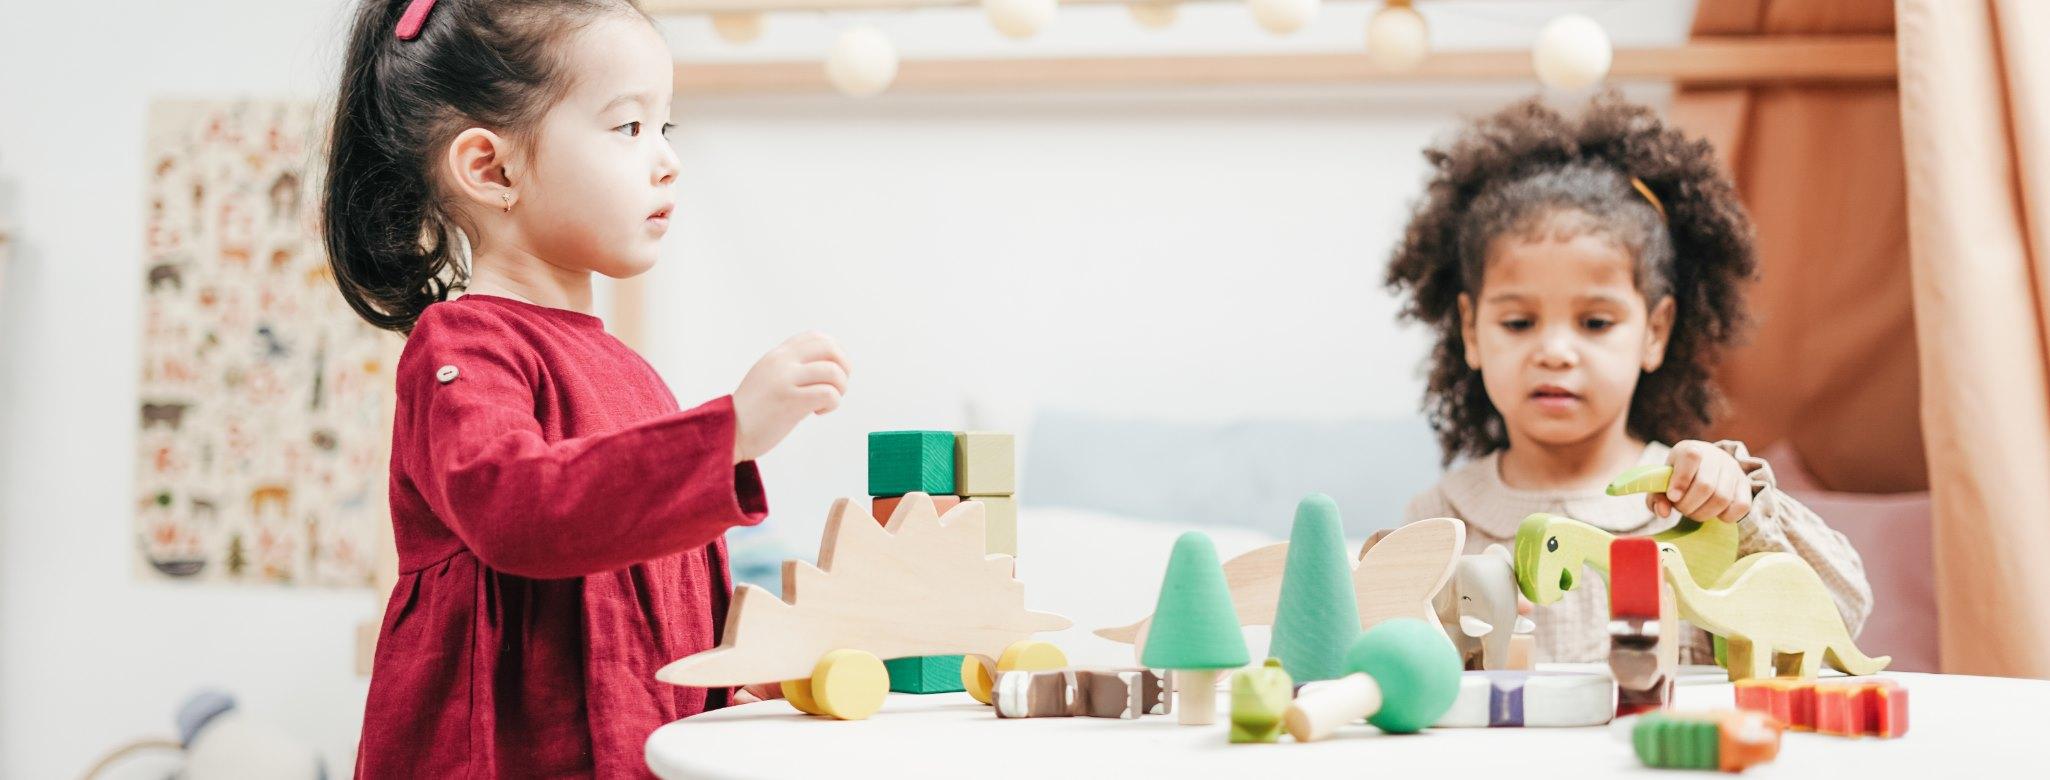 Ashbourne Day Nurseries at Fenny Stratford's main image